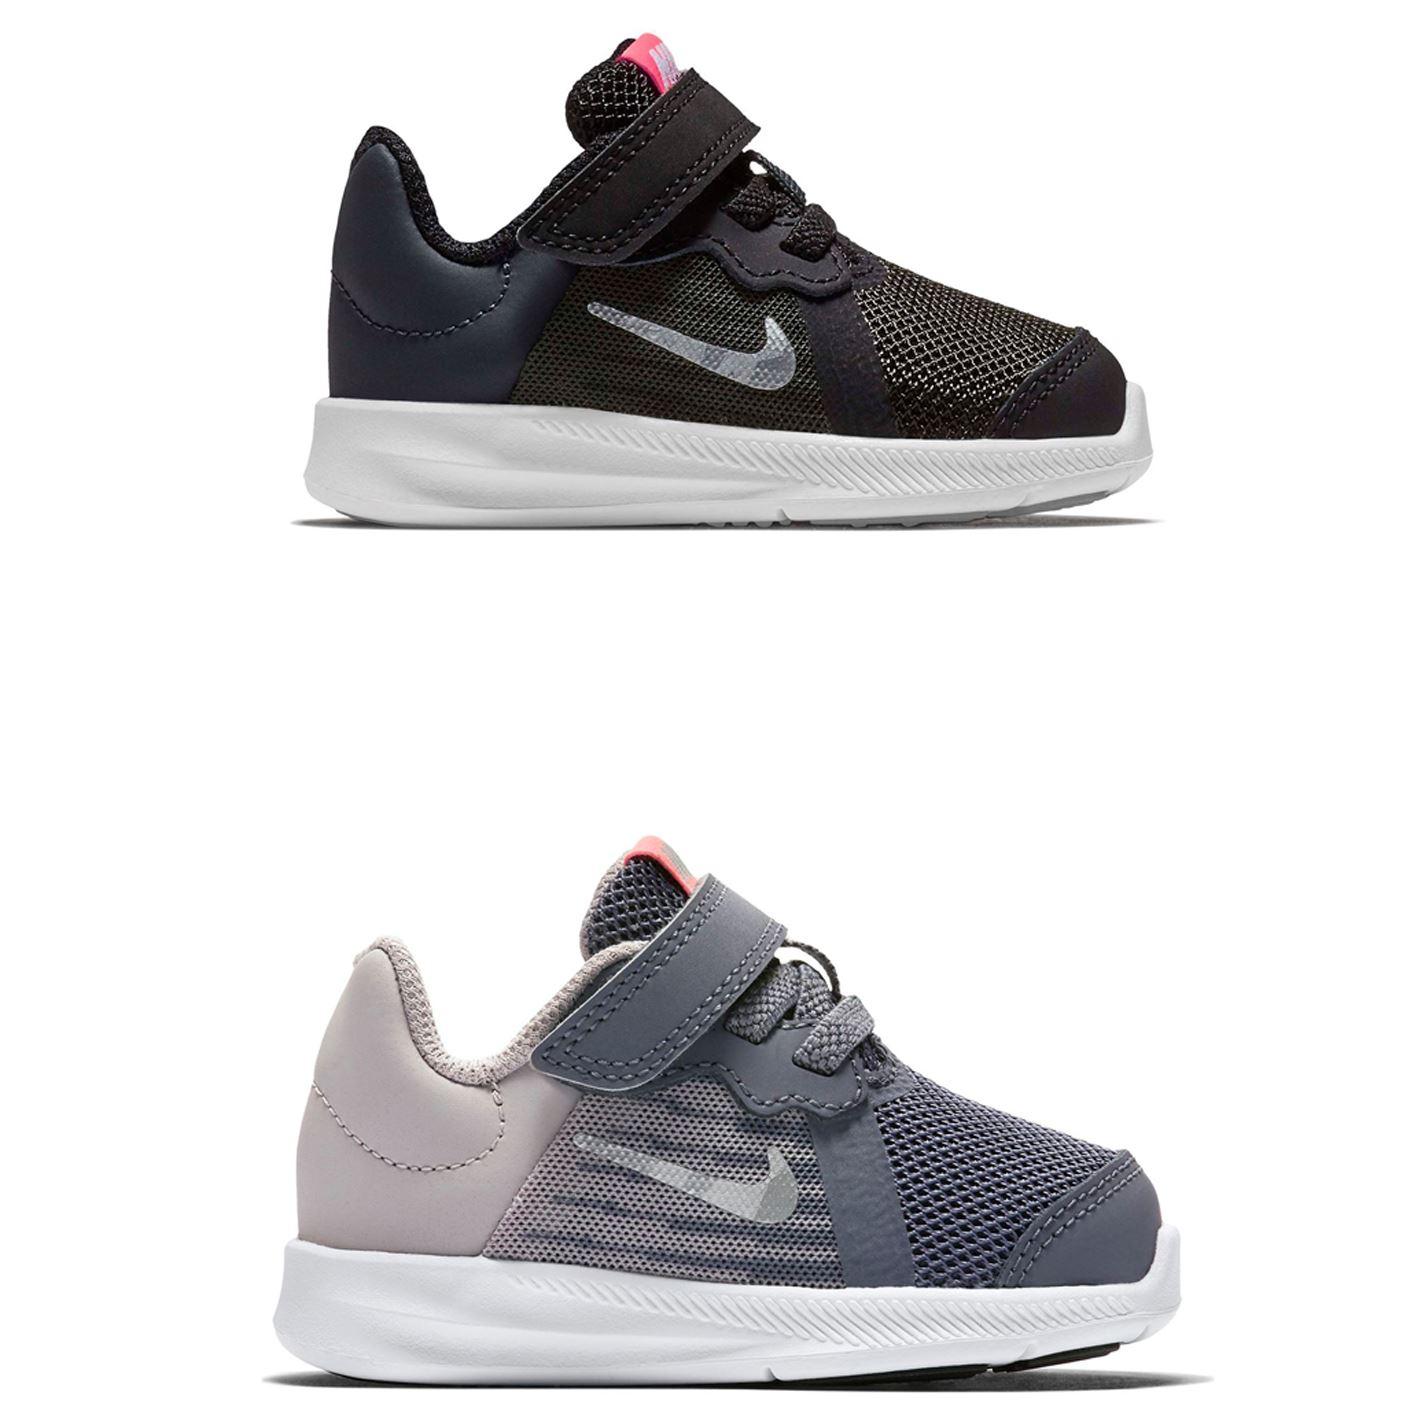 5e9e5f6eab2c ... Nike Downshifter 8 Trainers Infant Girls Shoes Footwear ...